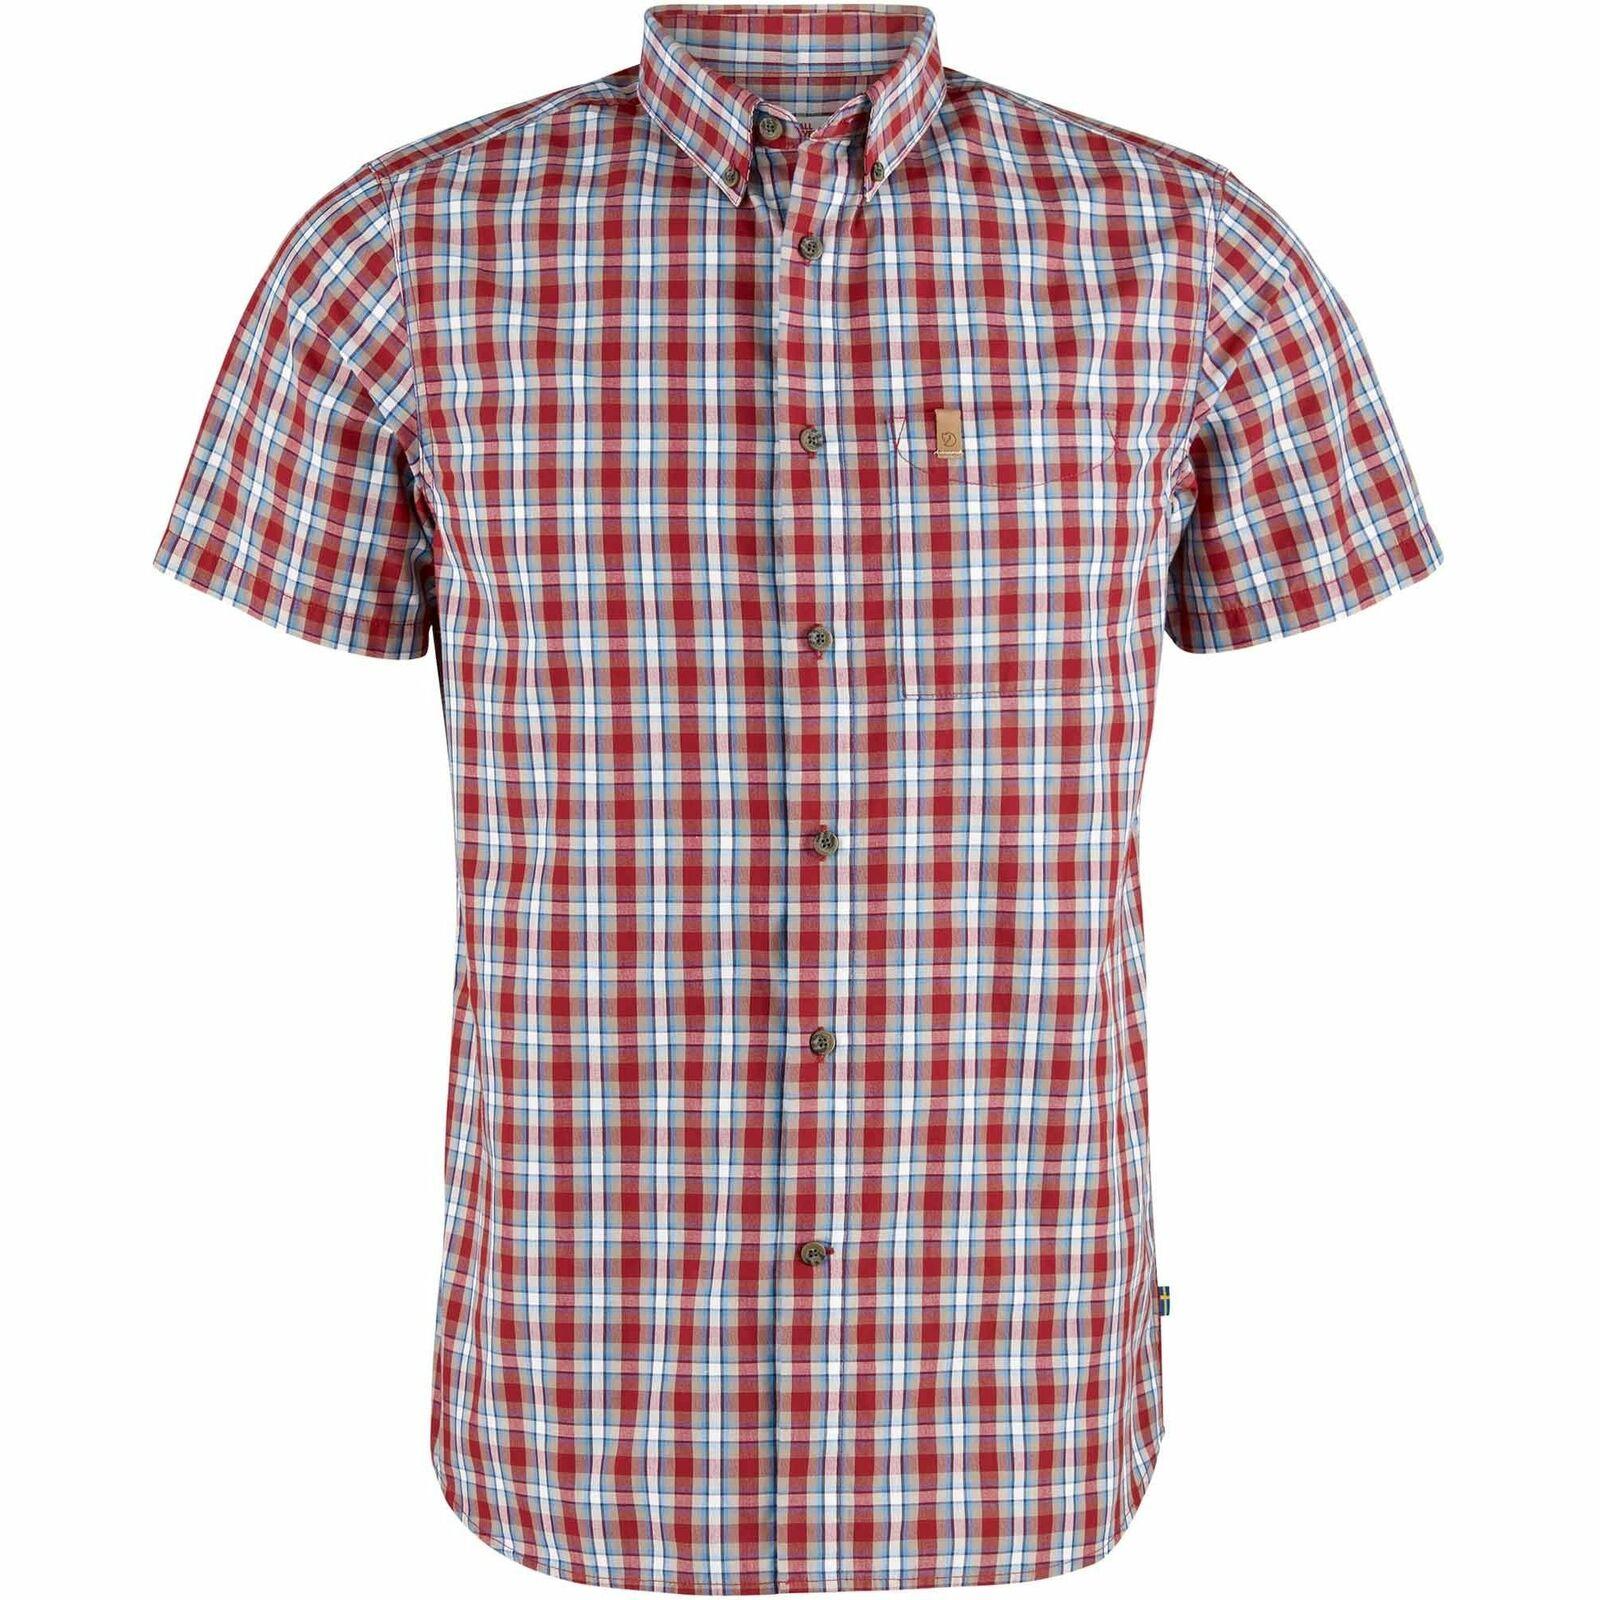 Fjallraven Ovik Shirt Short Sleeve